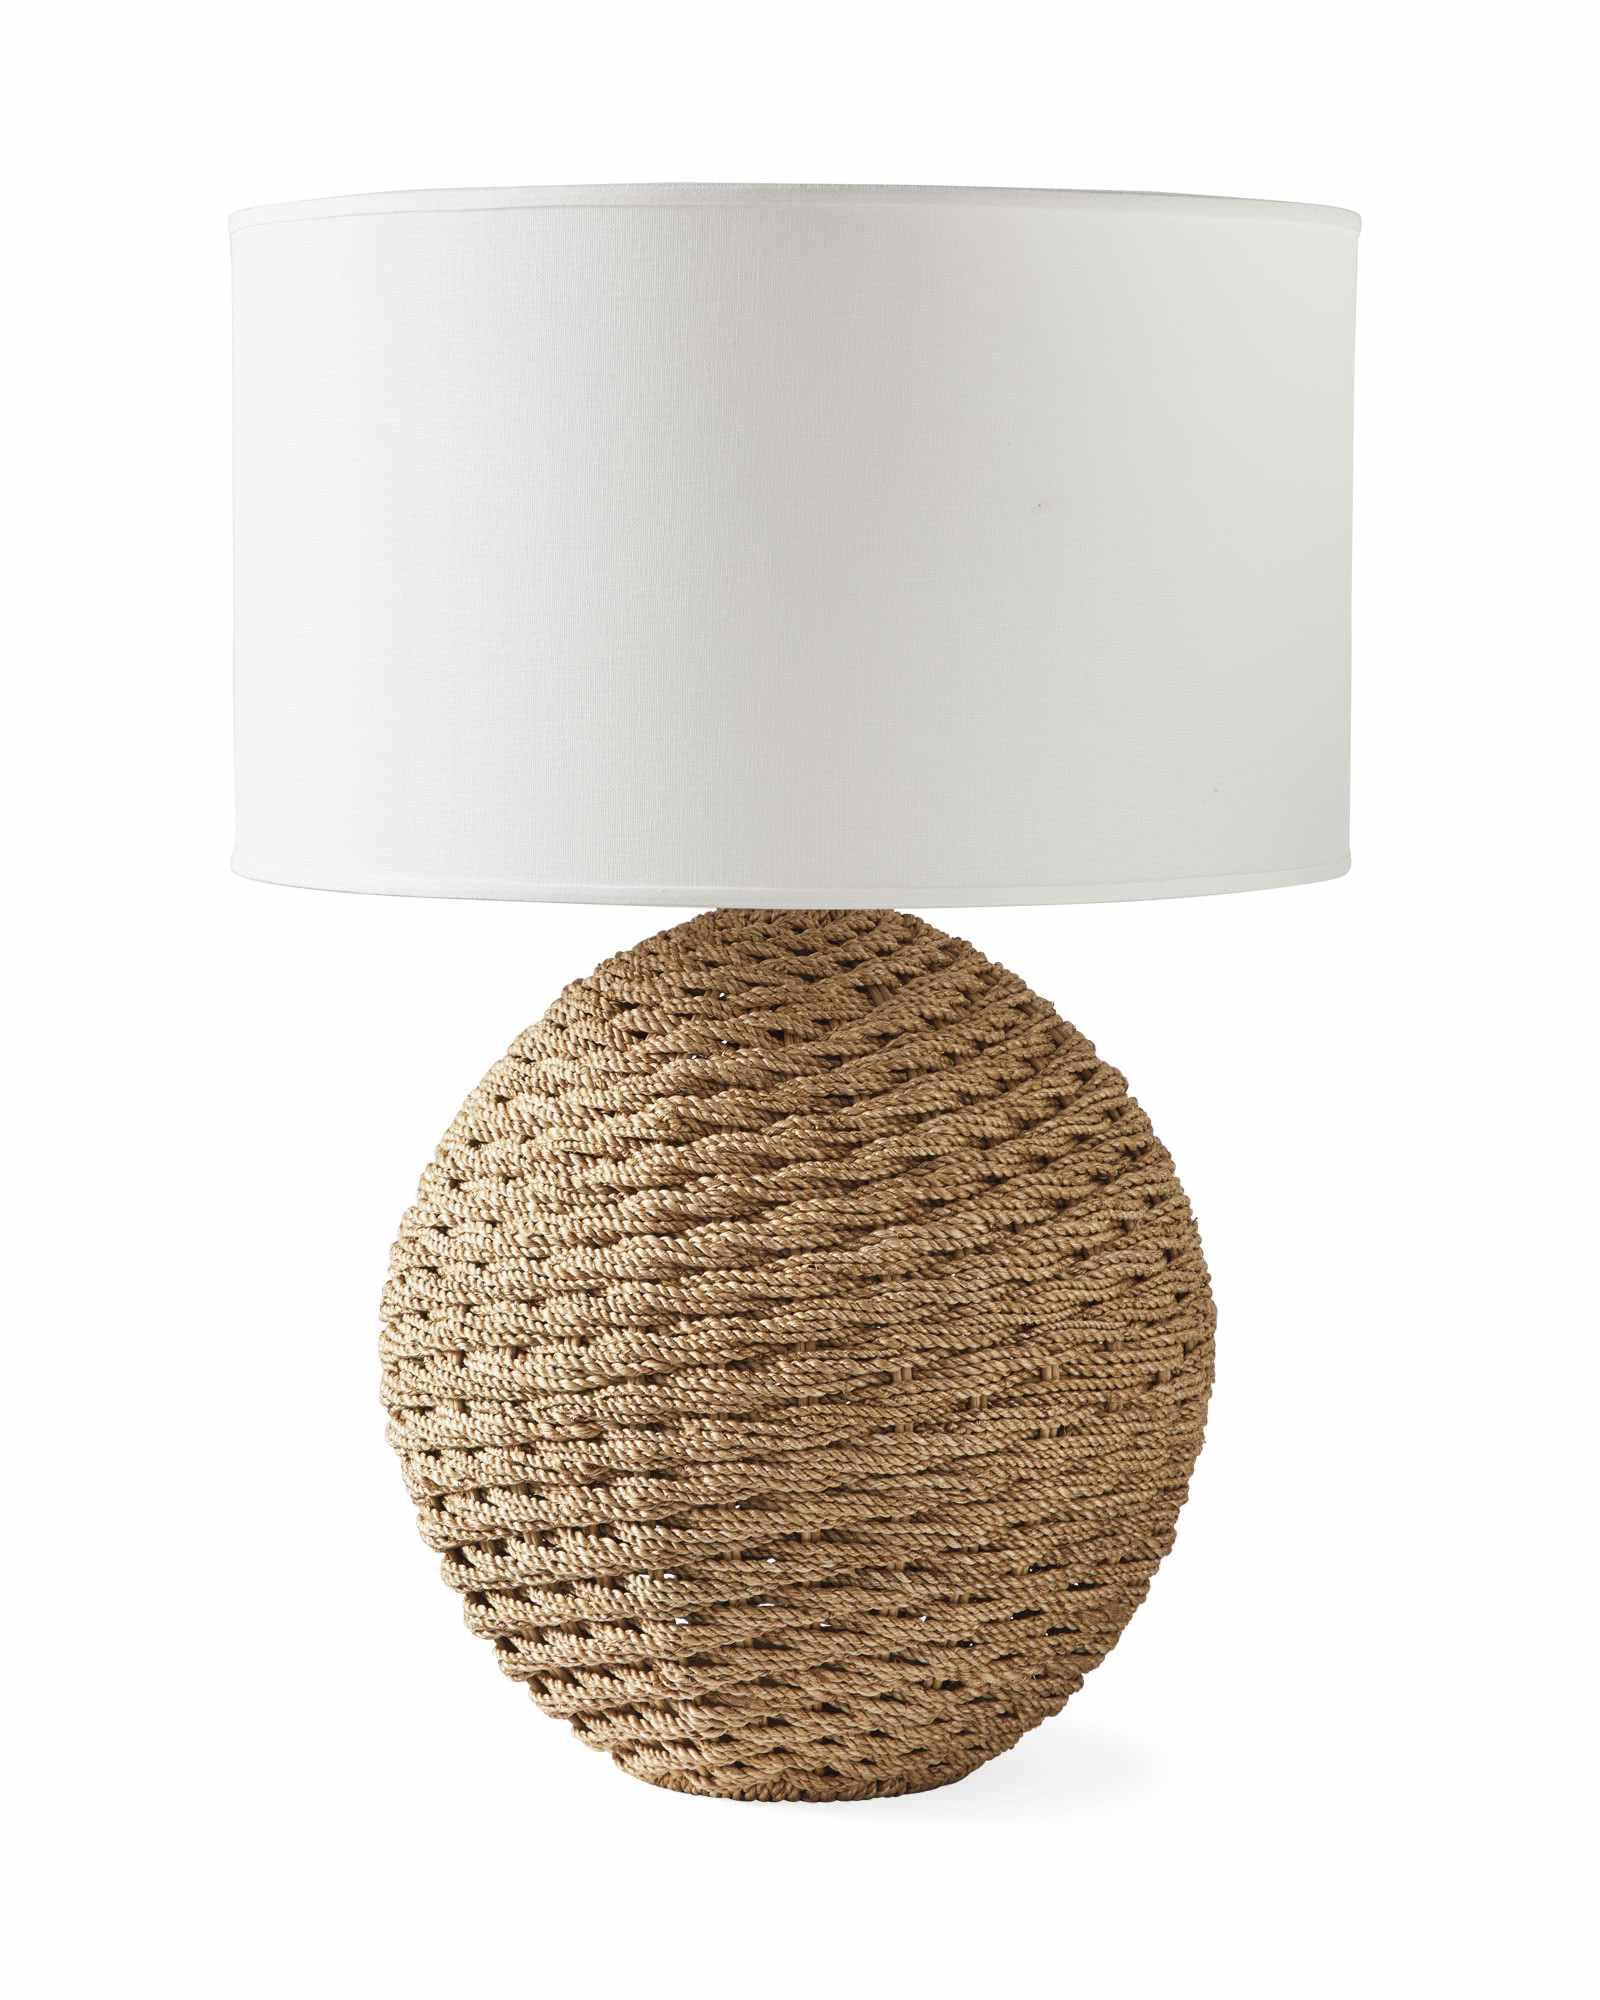 serena & lily abbott table lamp